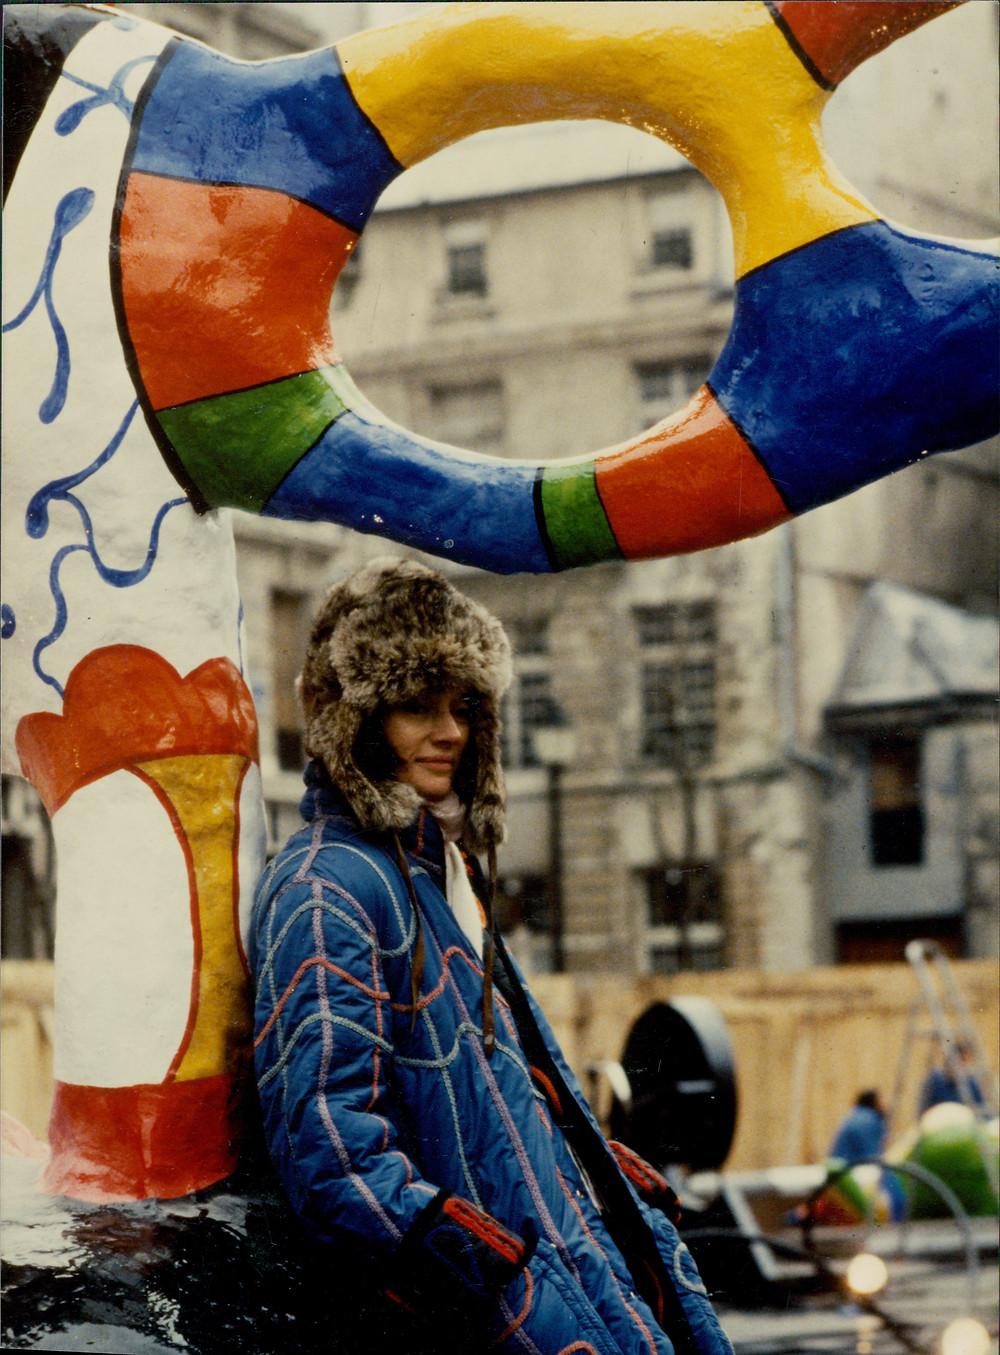 Niki de Saint Phalle with La fontaine Stravinsky.jpg  Niki de Saint Phalle with La fontaine Stravinsky. Photo: Leonardo Bezzola © Leonardo Bezzola Estate